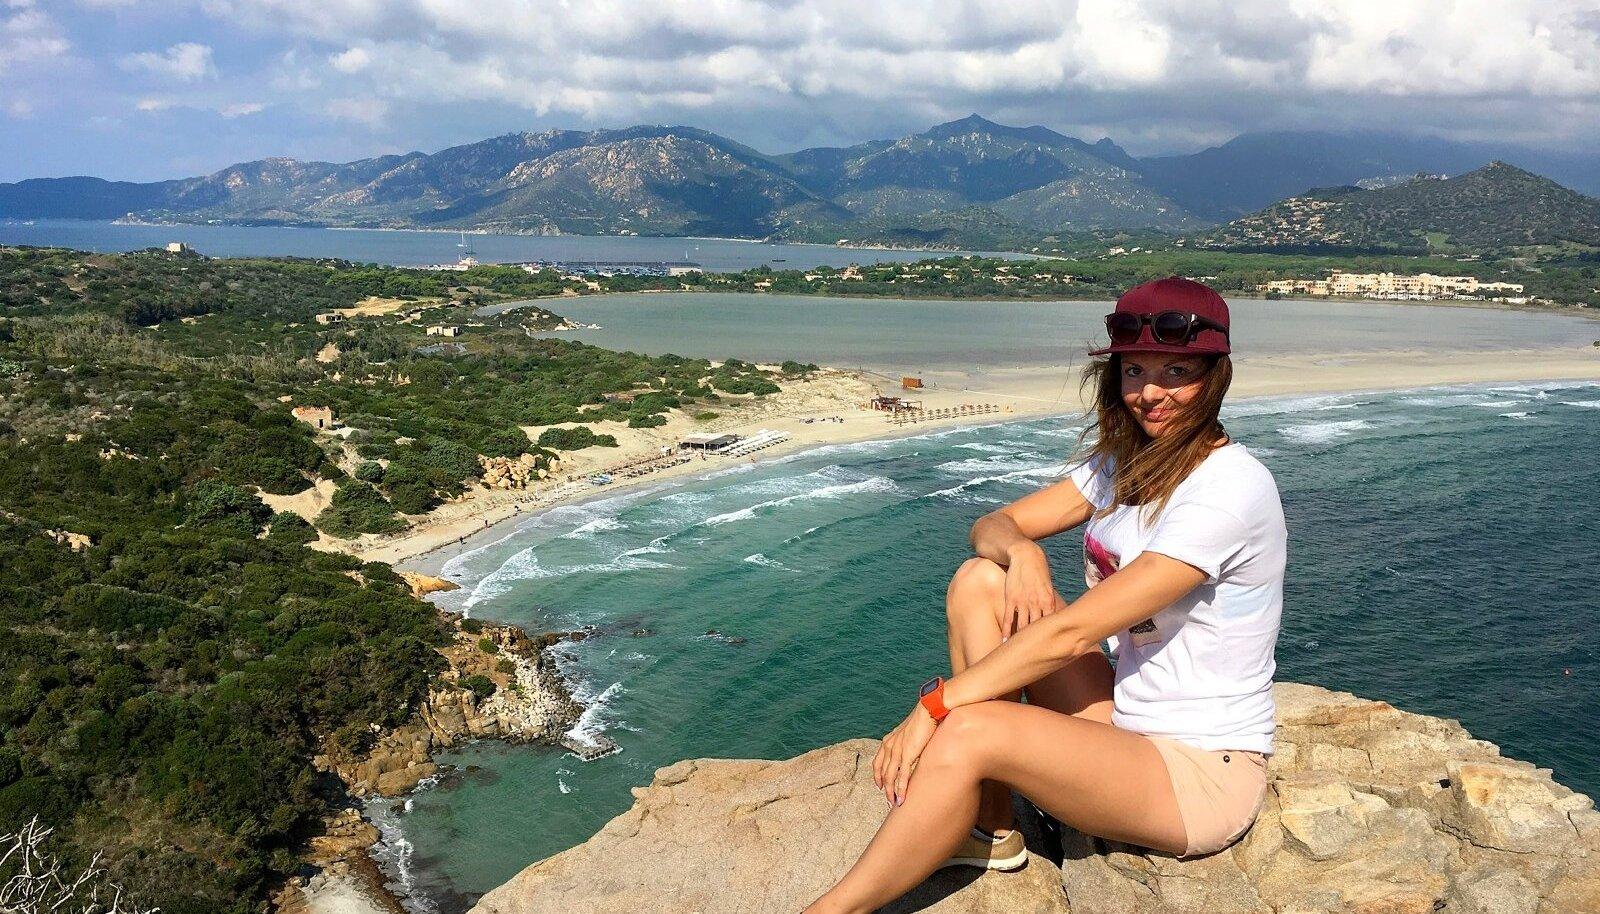 Vaade matkaraja tipust Porto Giunco rannale.